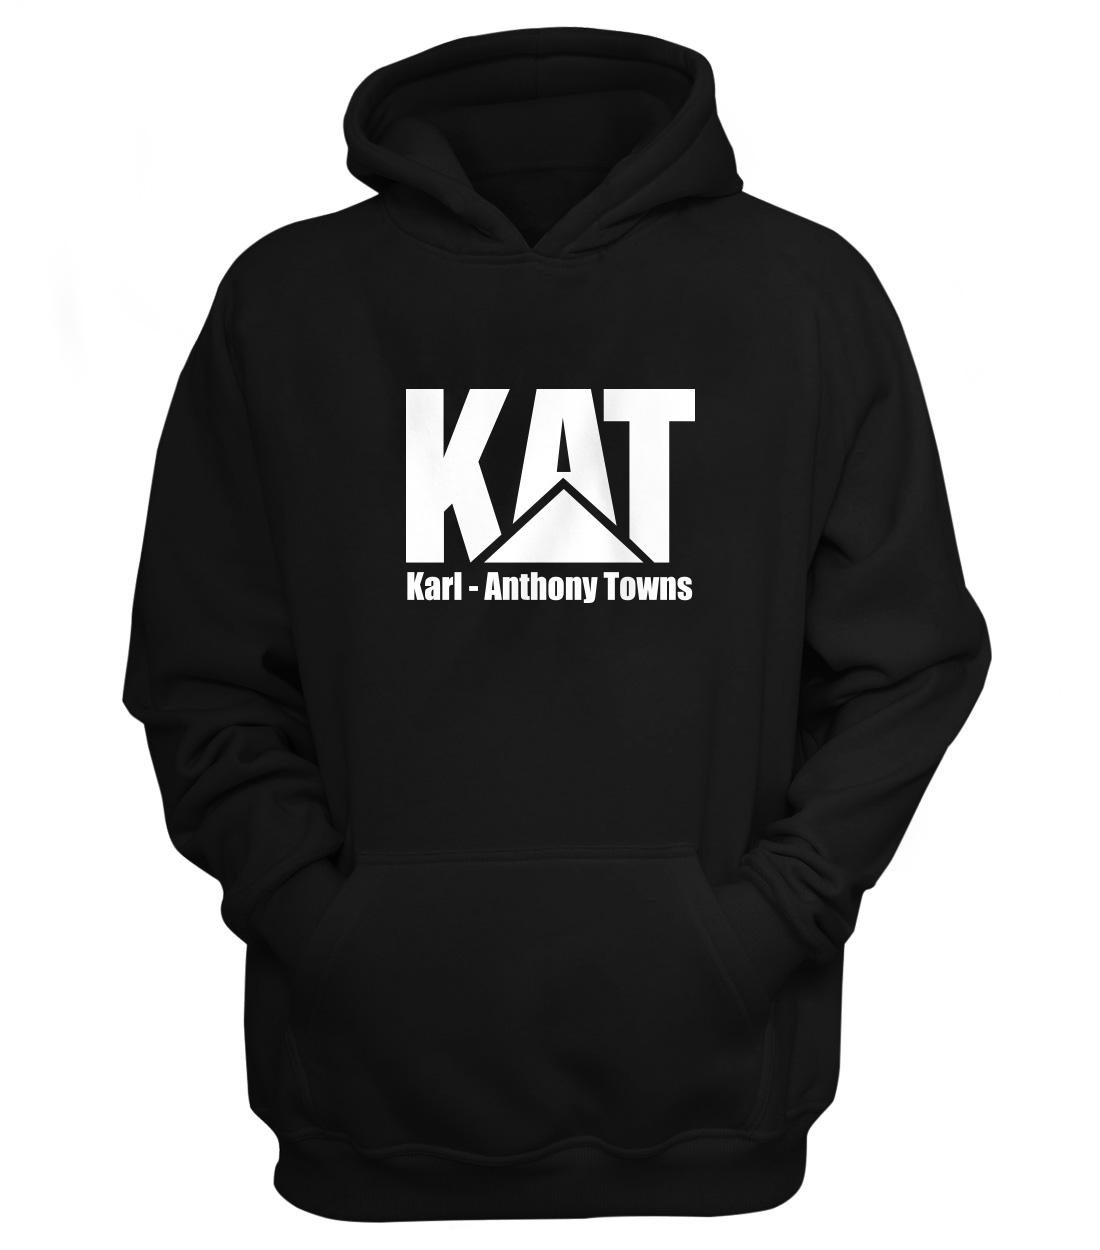 Karl Anthony Towns Hoodie (HD-BLC-NP-kat-logo-616)